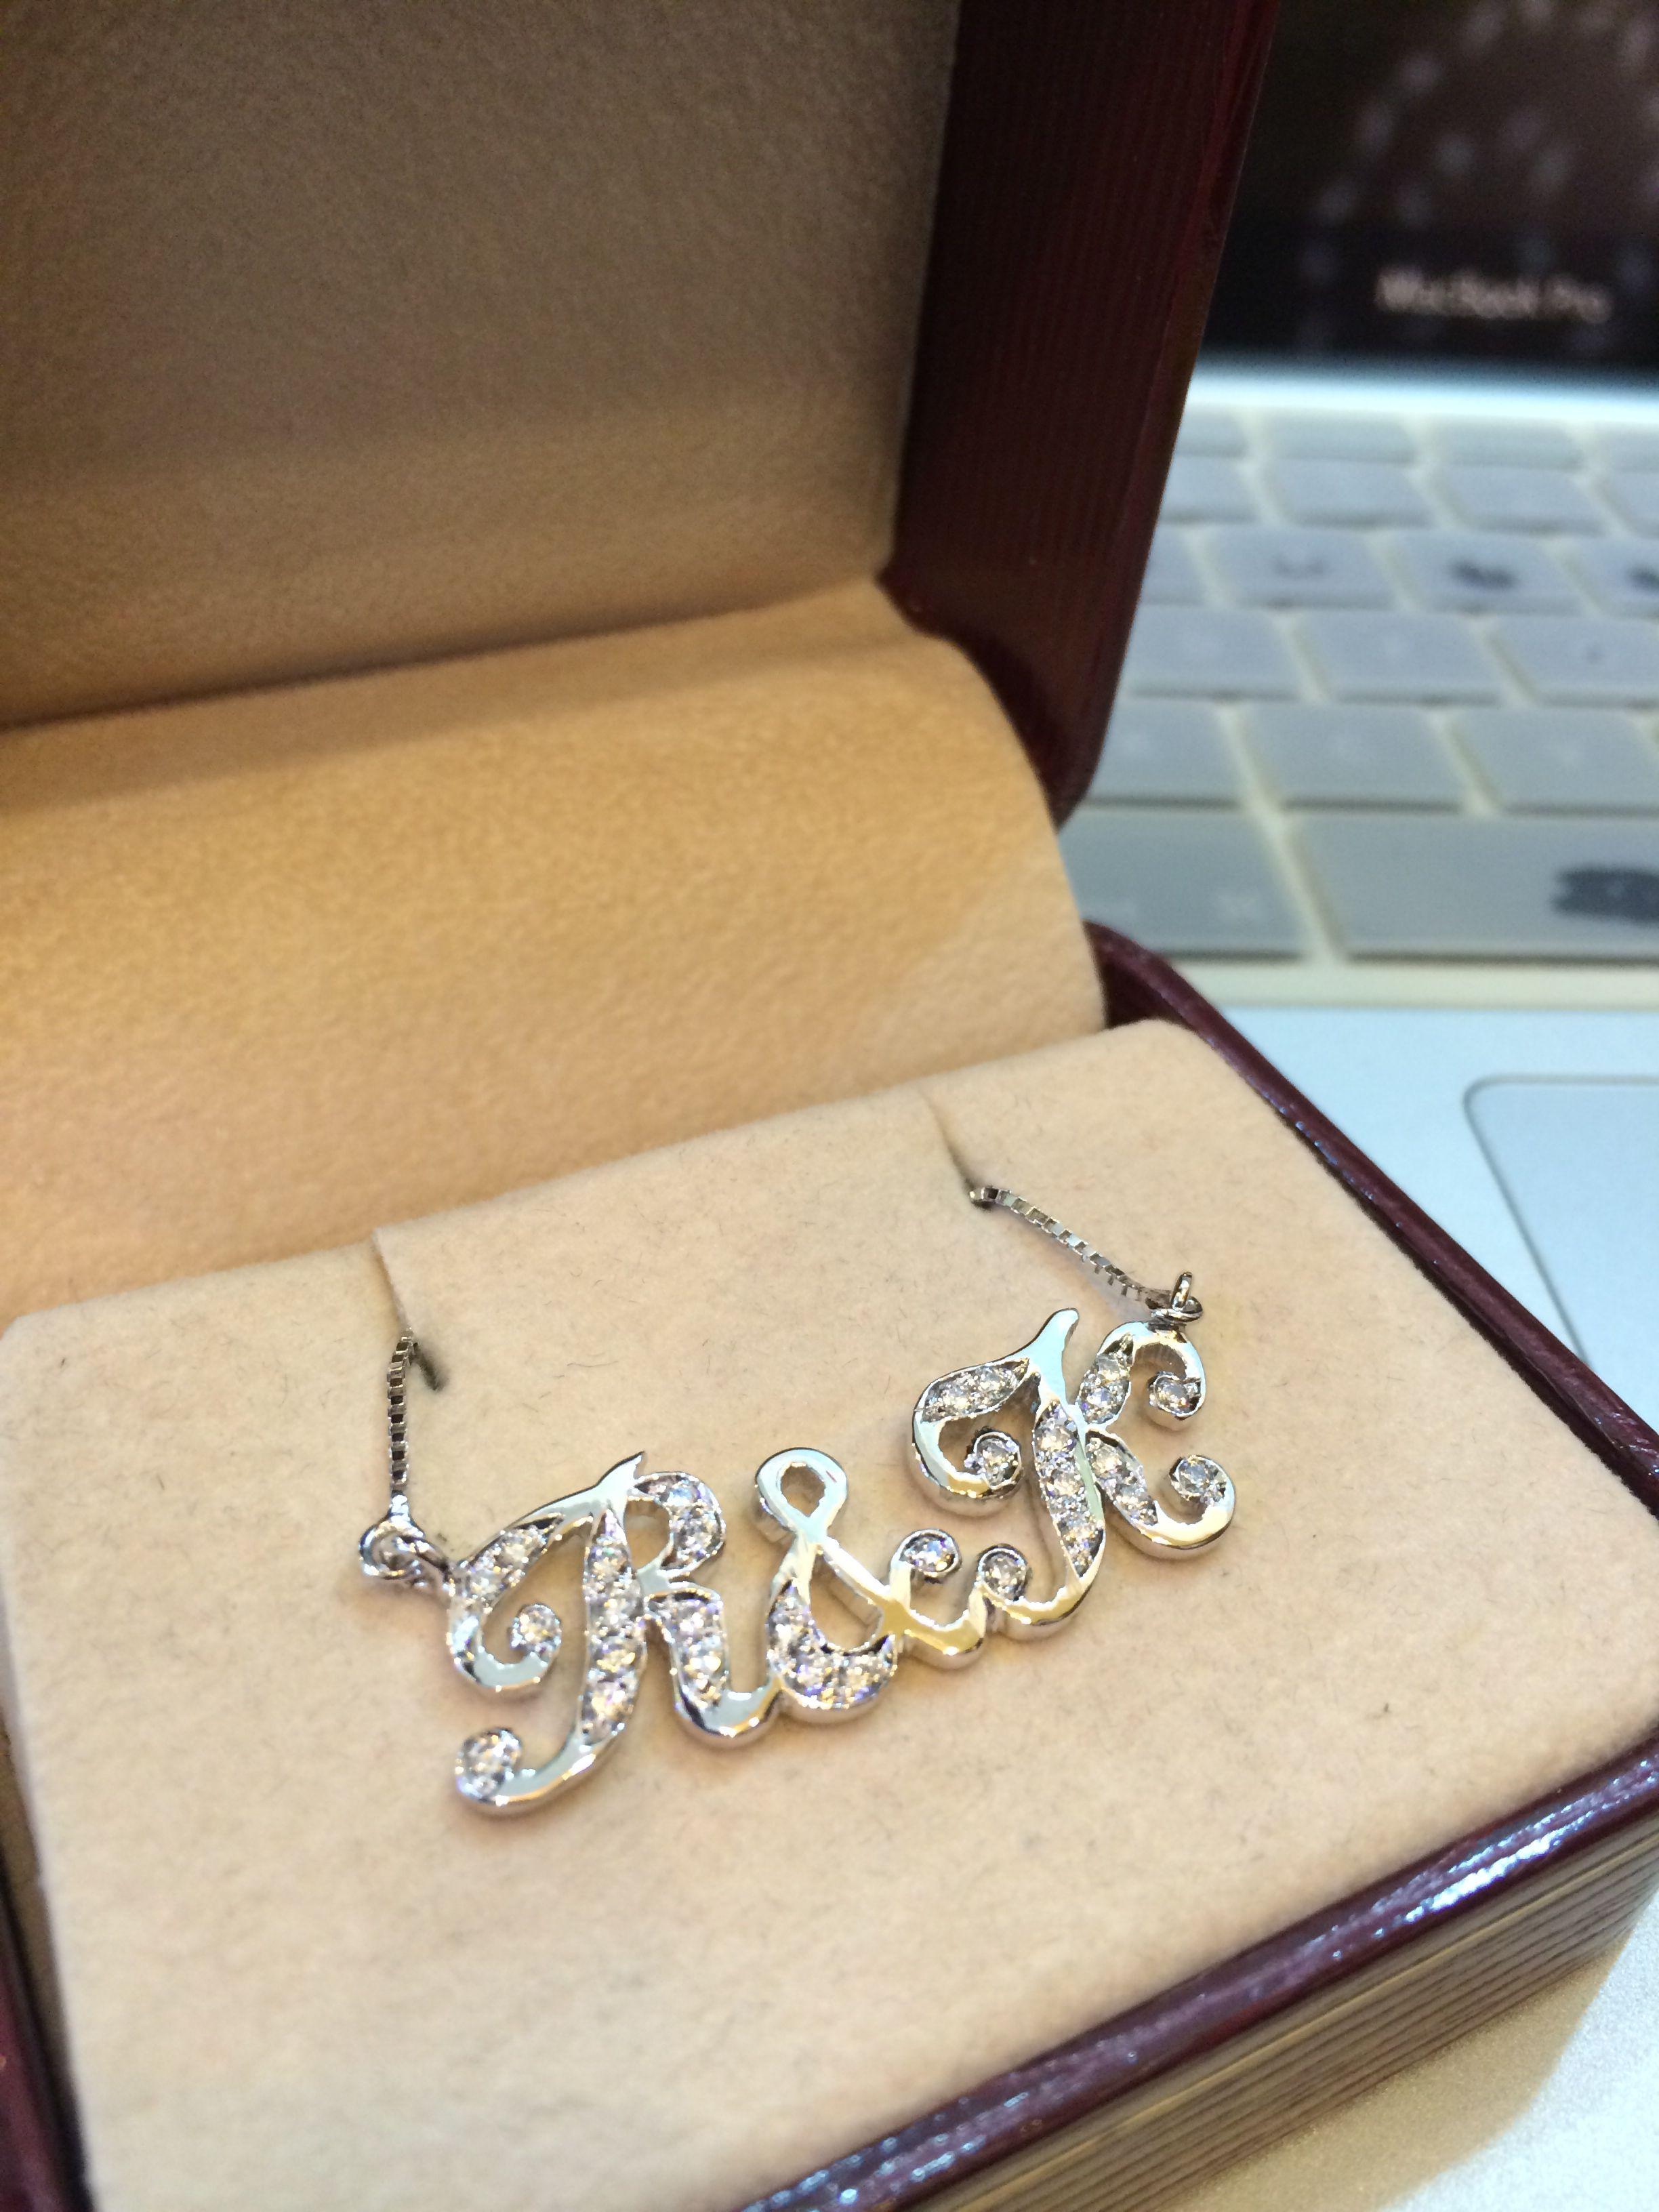 CZ on silver 925 pendant